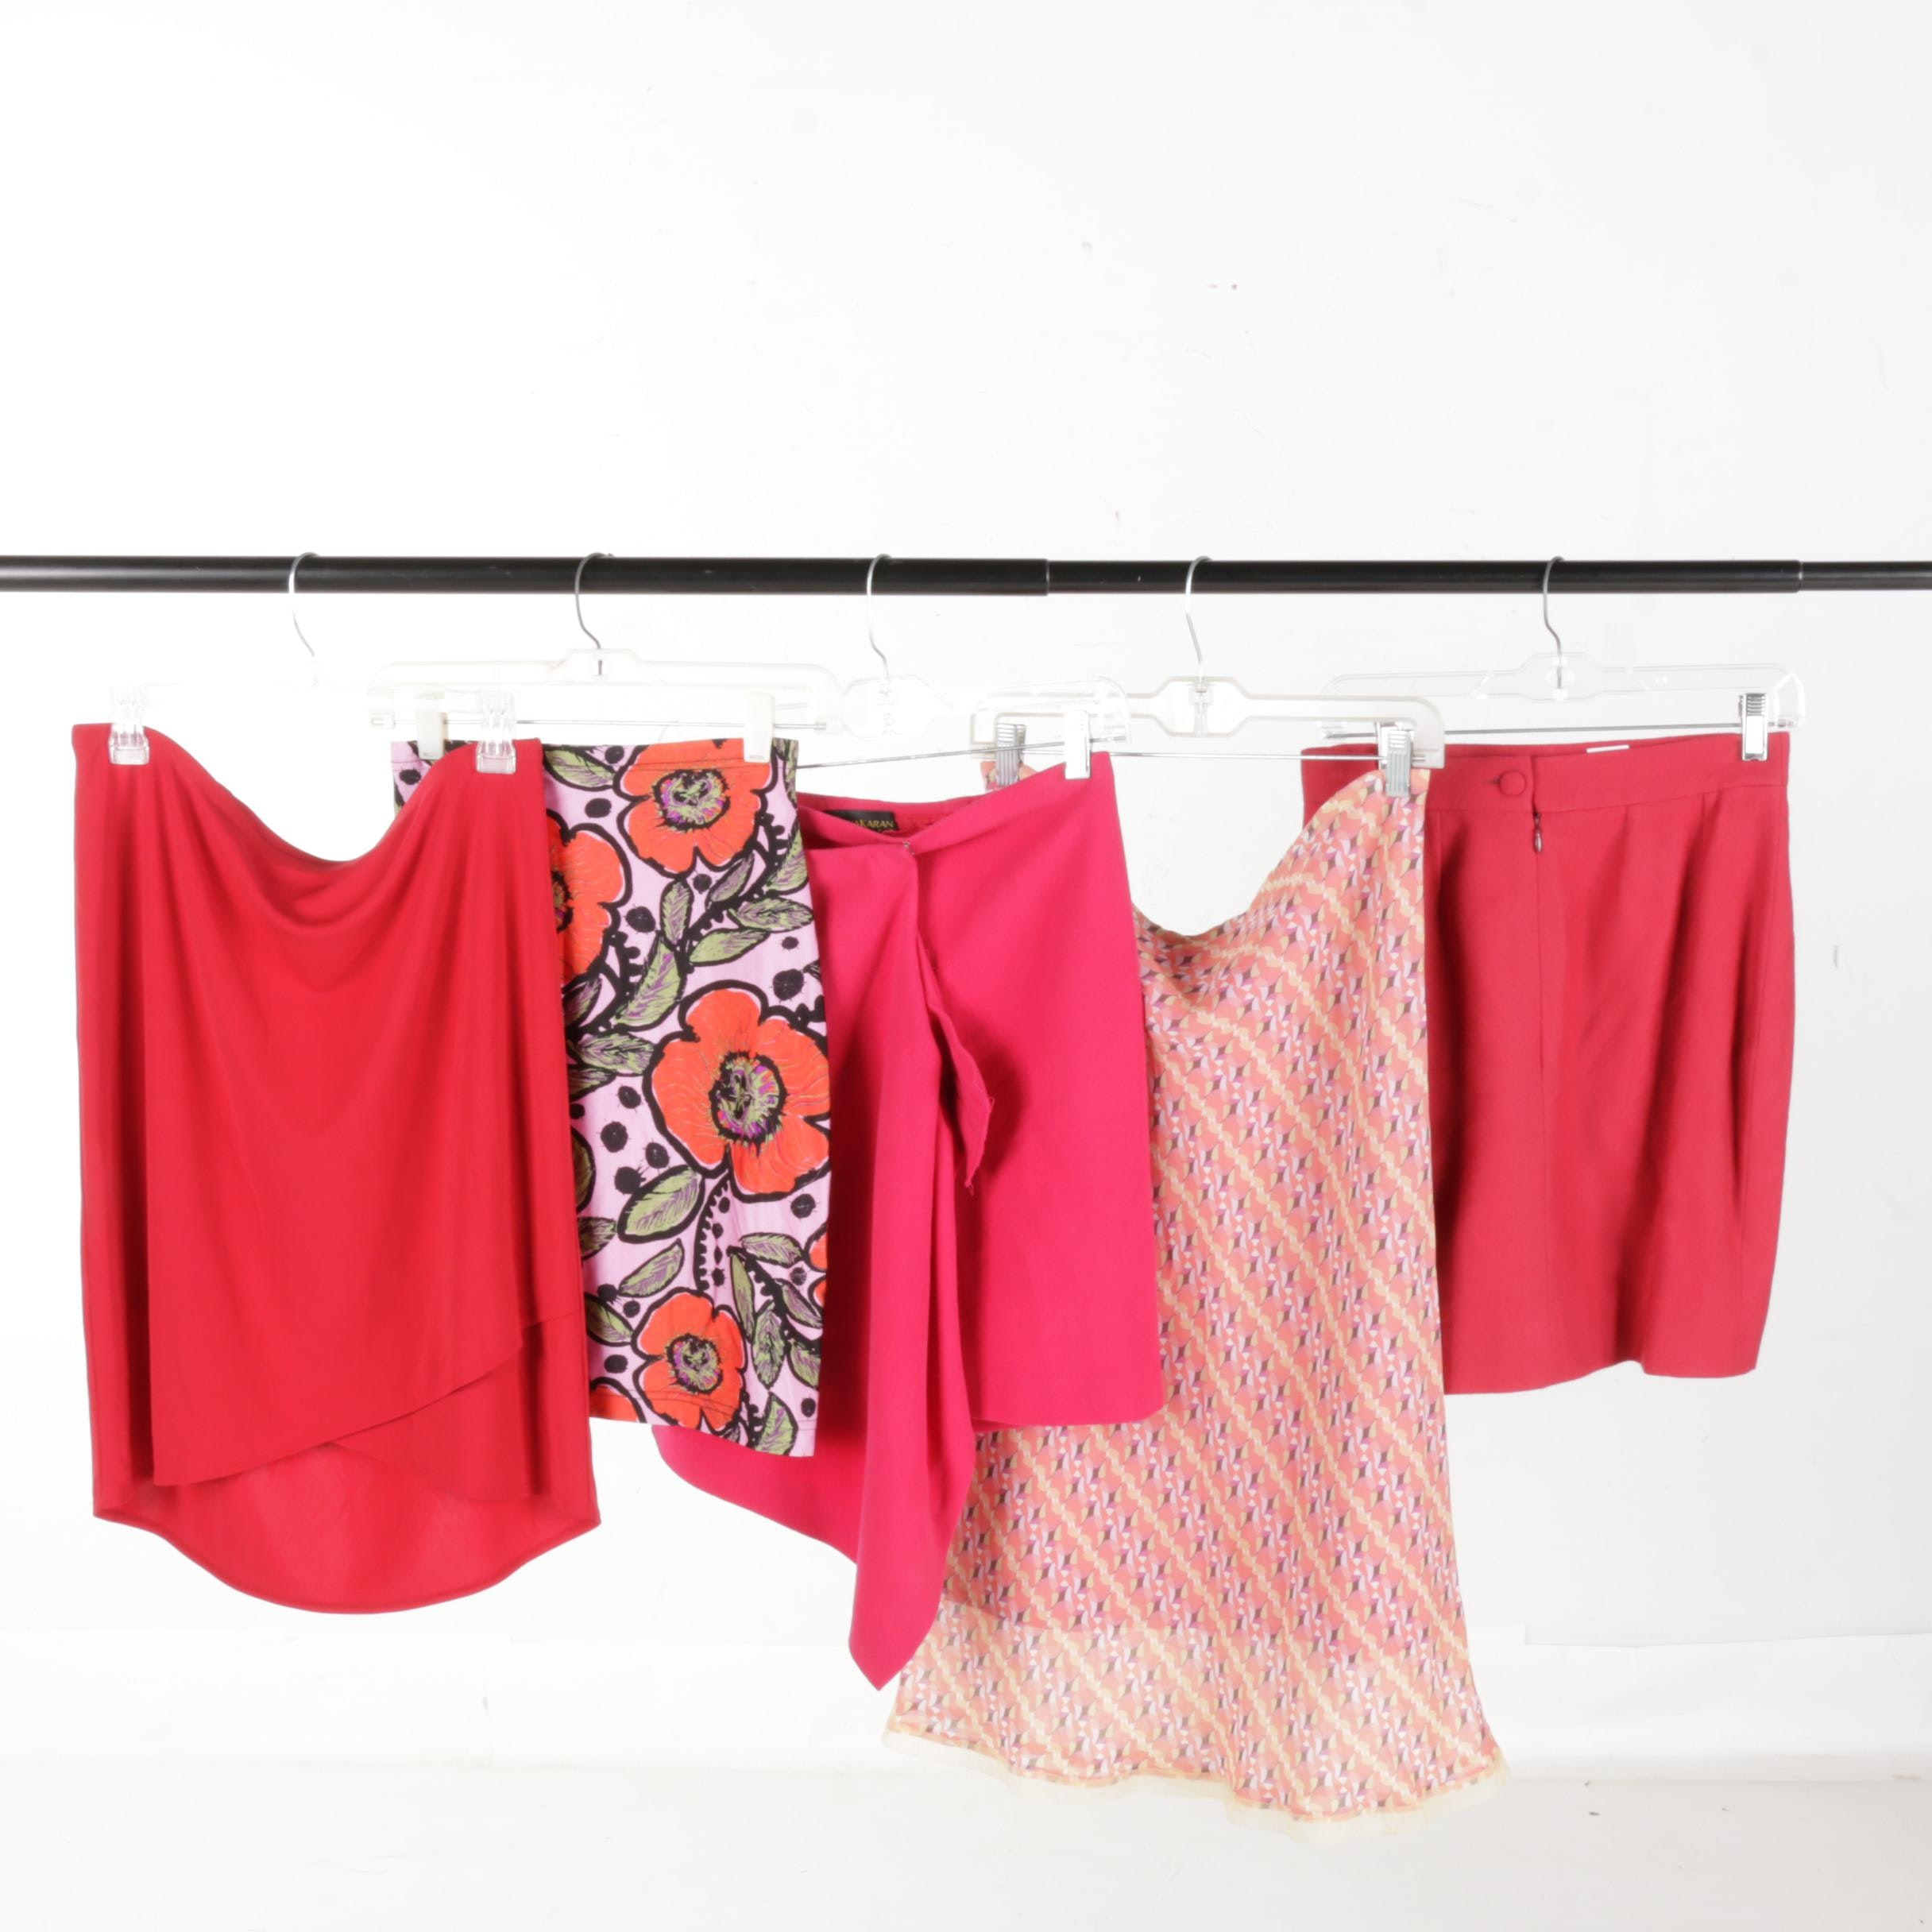 Women's Skirts Including Donna Karan and Express